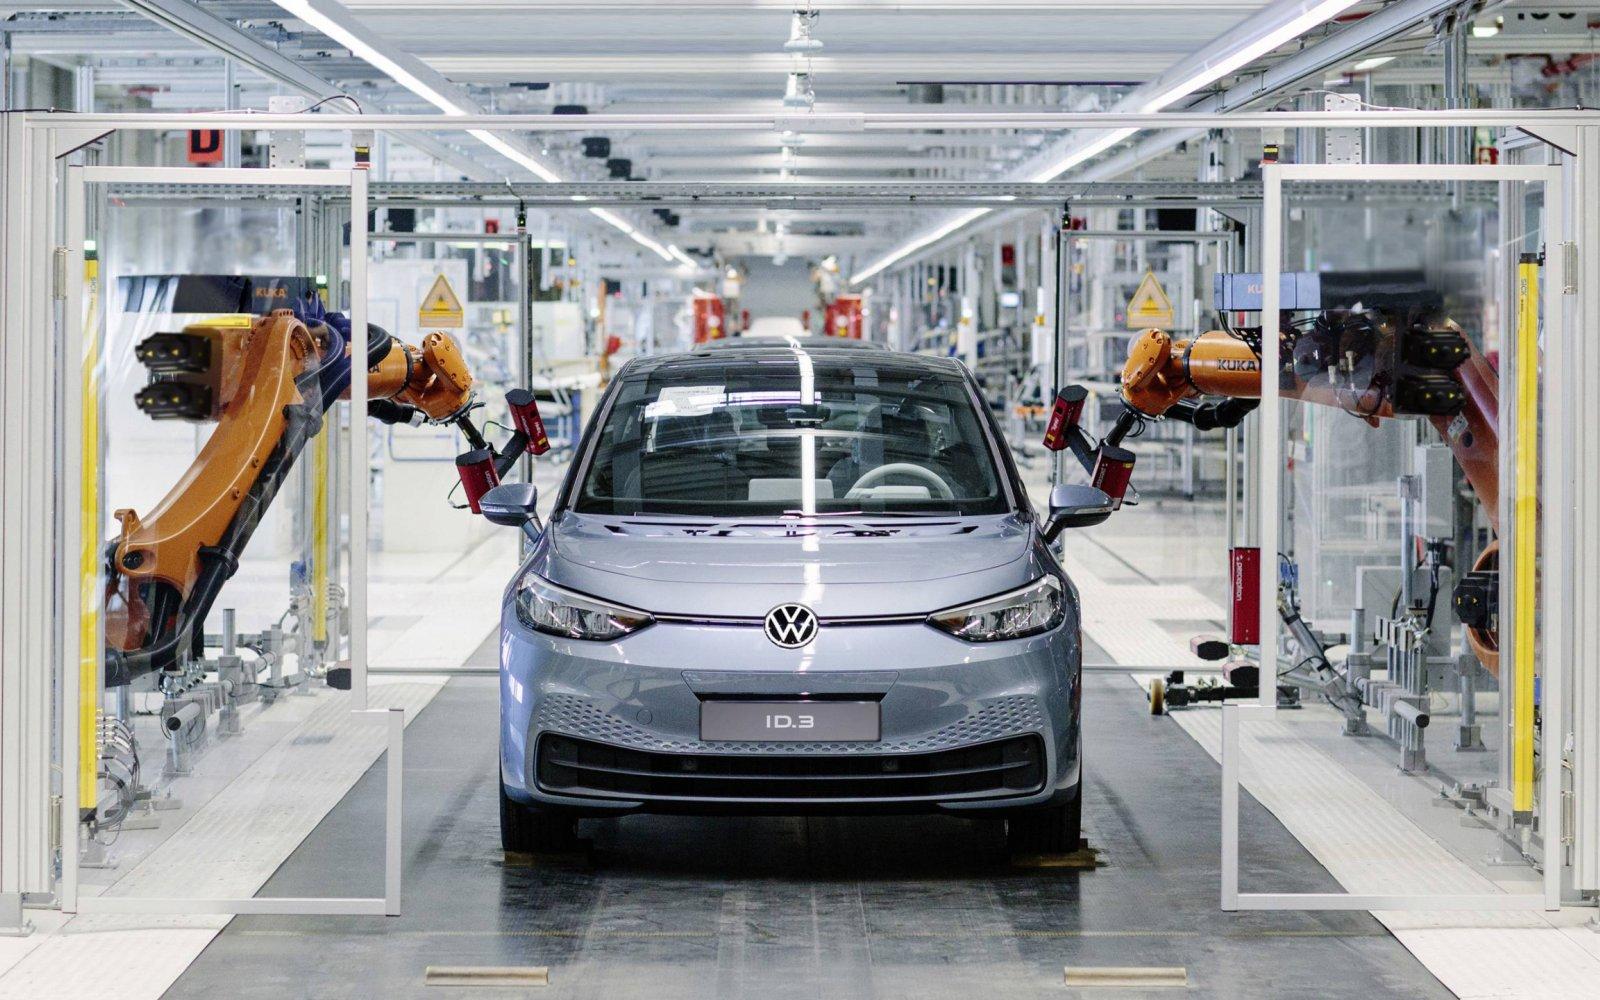 Volkswagen ID.3 gemaakt in fabriek die nog niet af is. Komt dat wel goed?